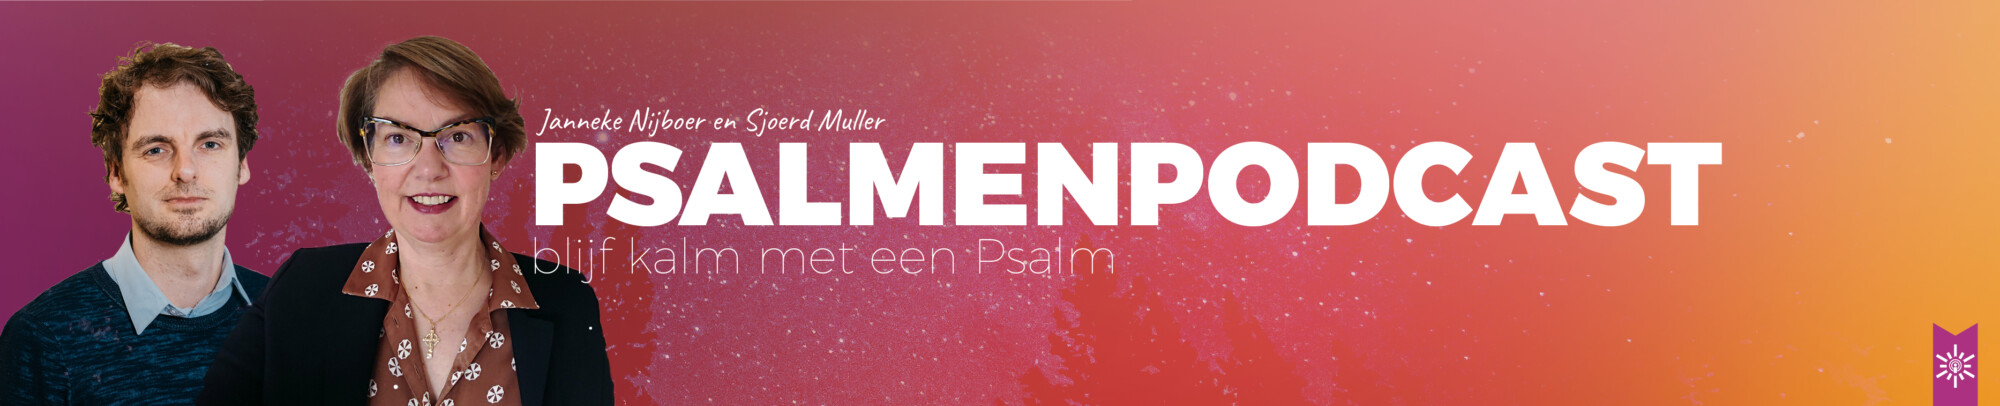 psalmen_podcast_sjoerd_janneke